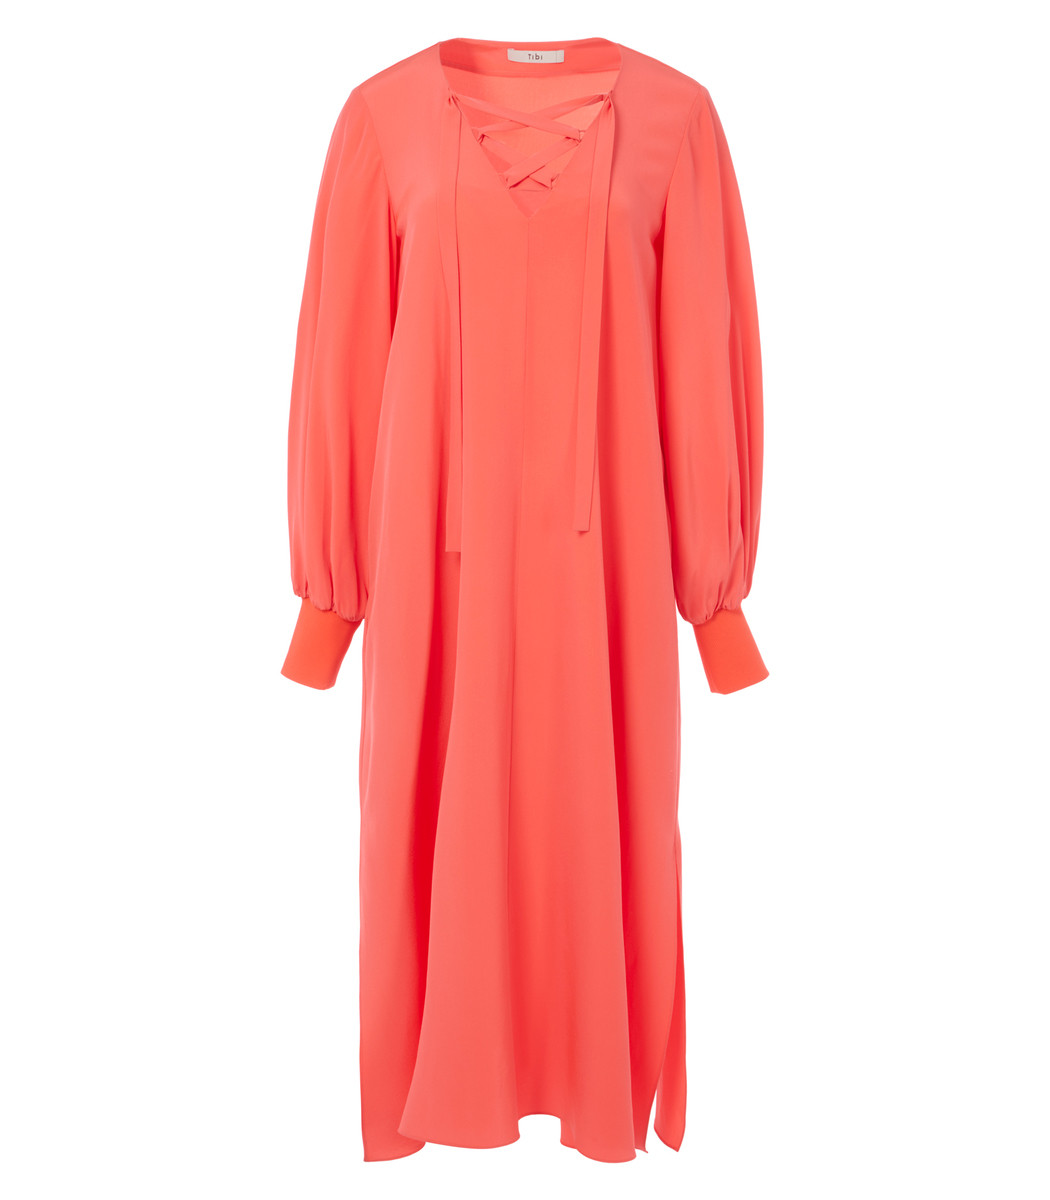 TIBI Neon Pink Silk Tie Front Tunic Dress